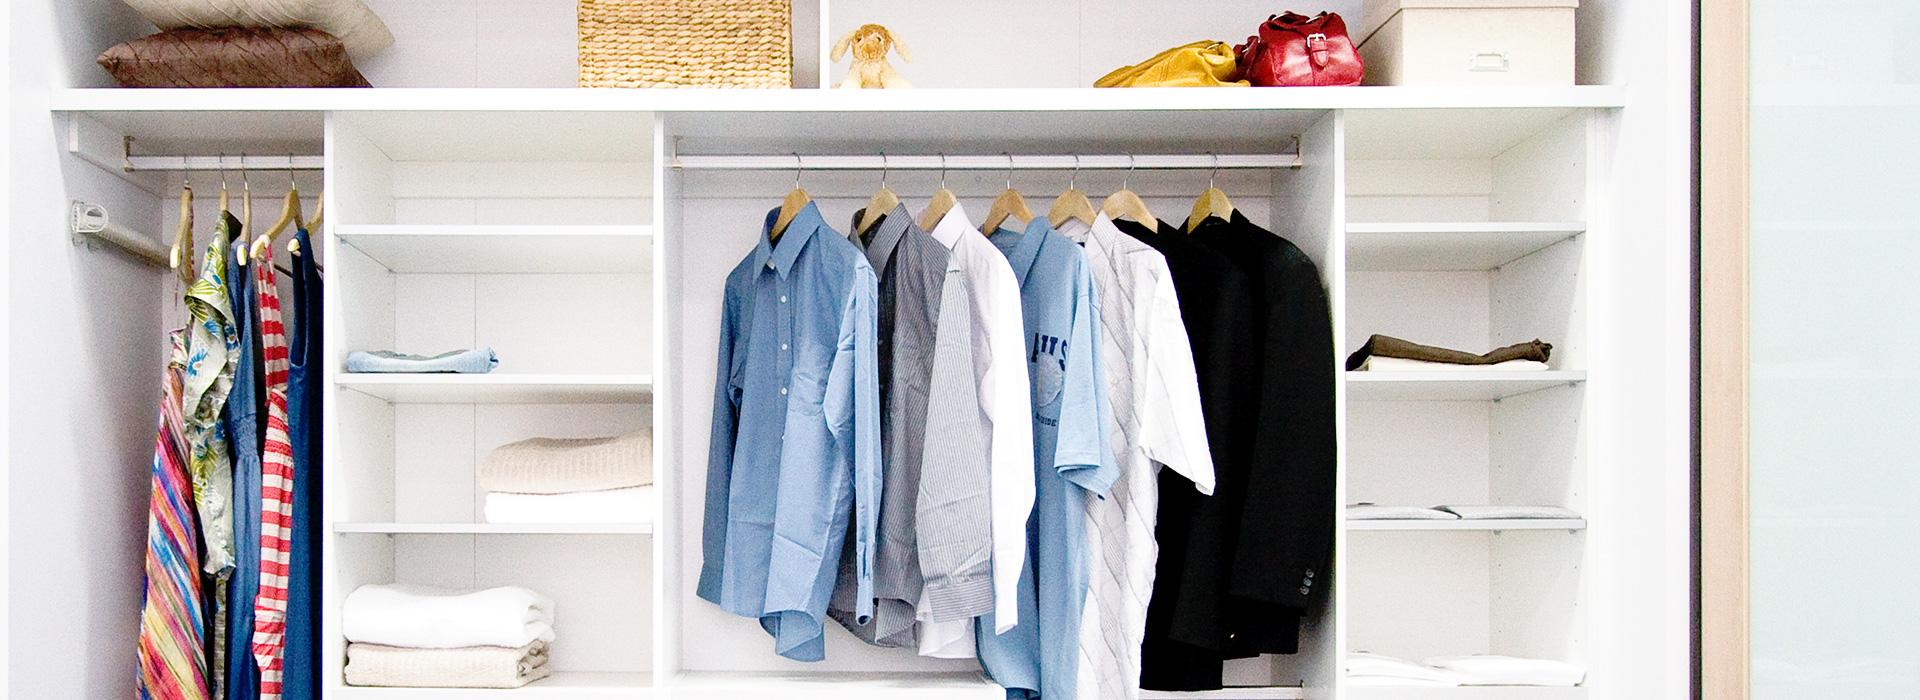 Wardrobe Connection